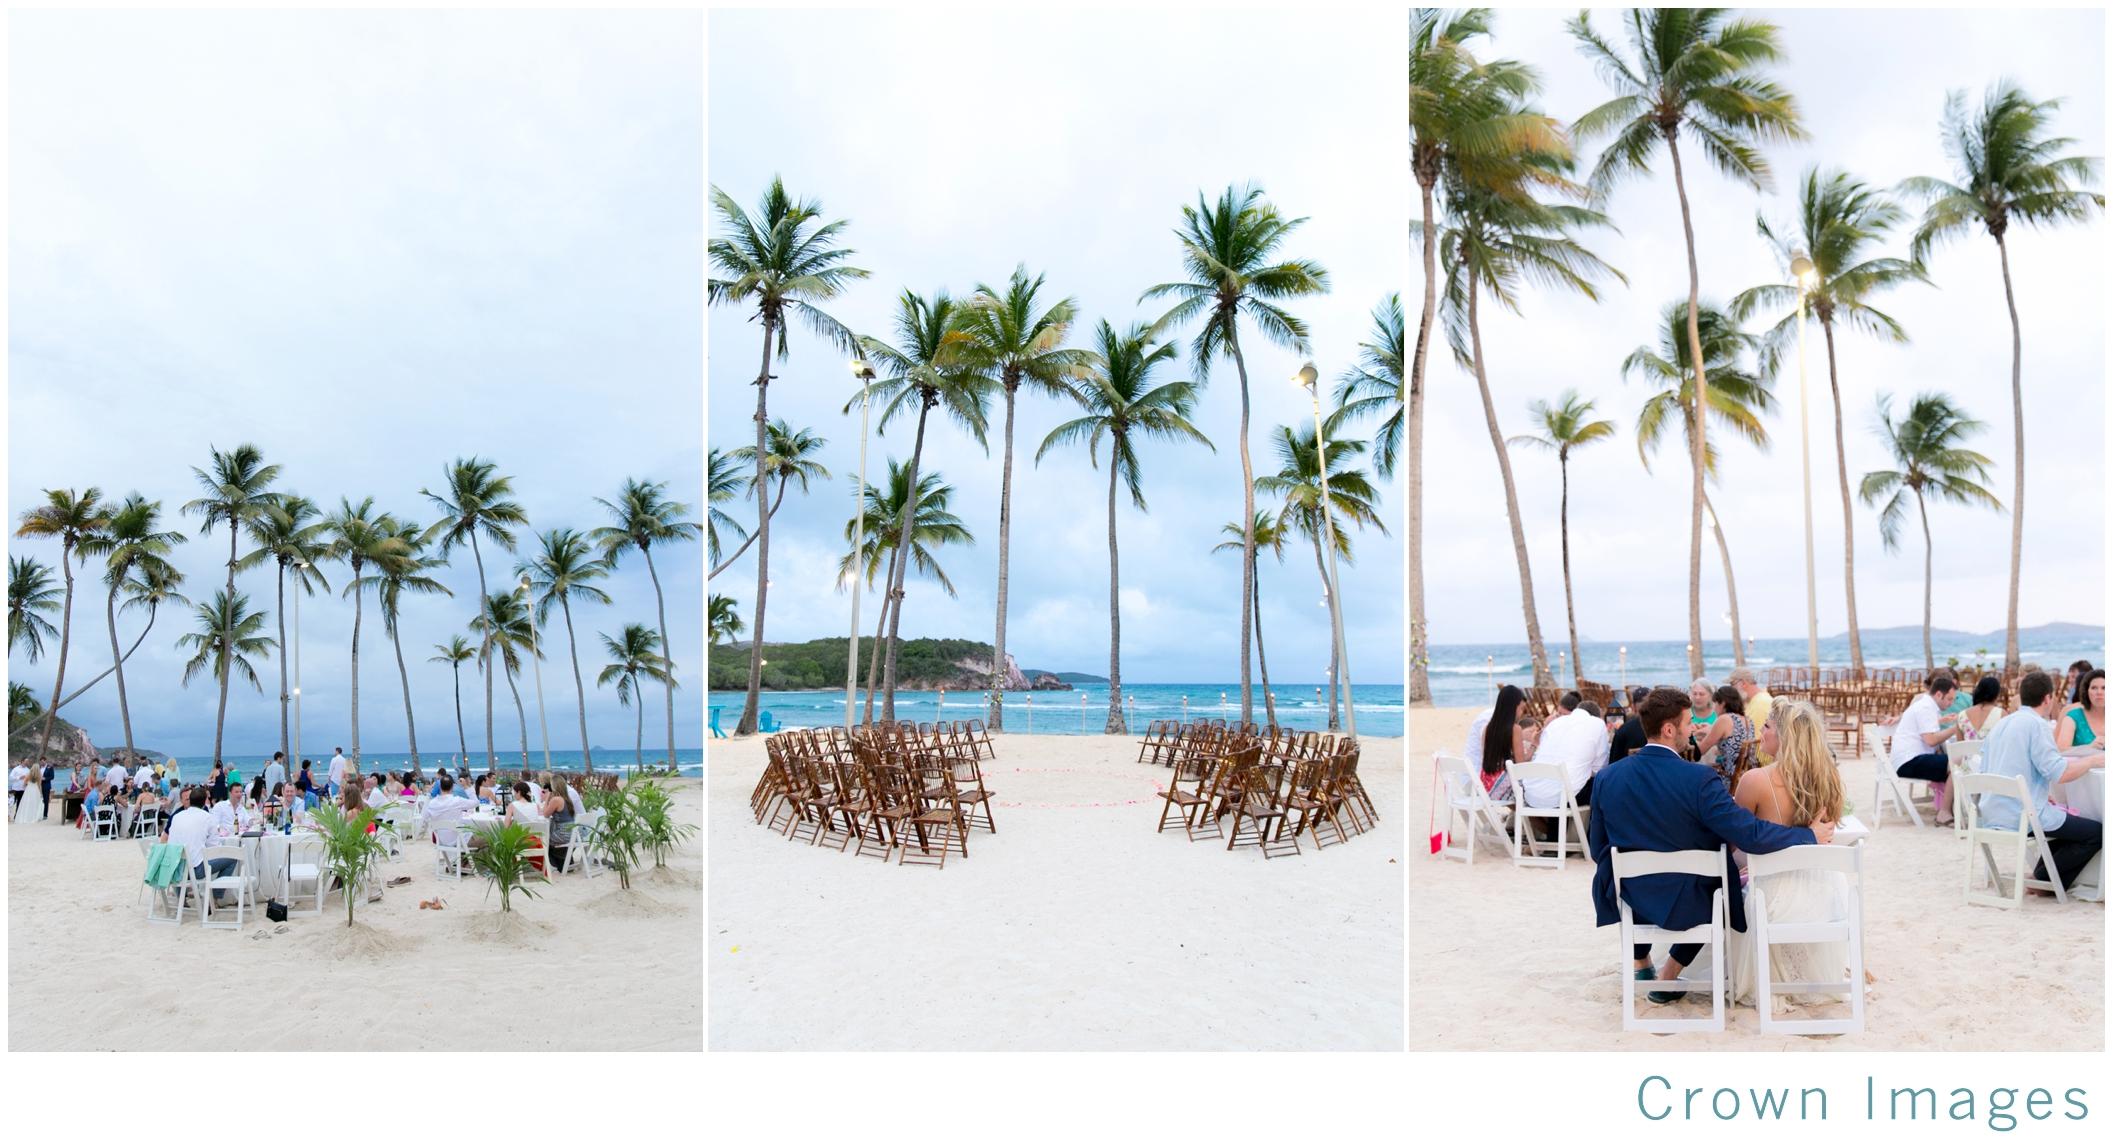 Bolongo bay beach resort wedding photos by crown images_1497.jpg